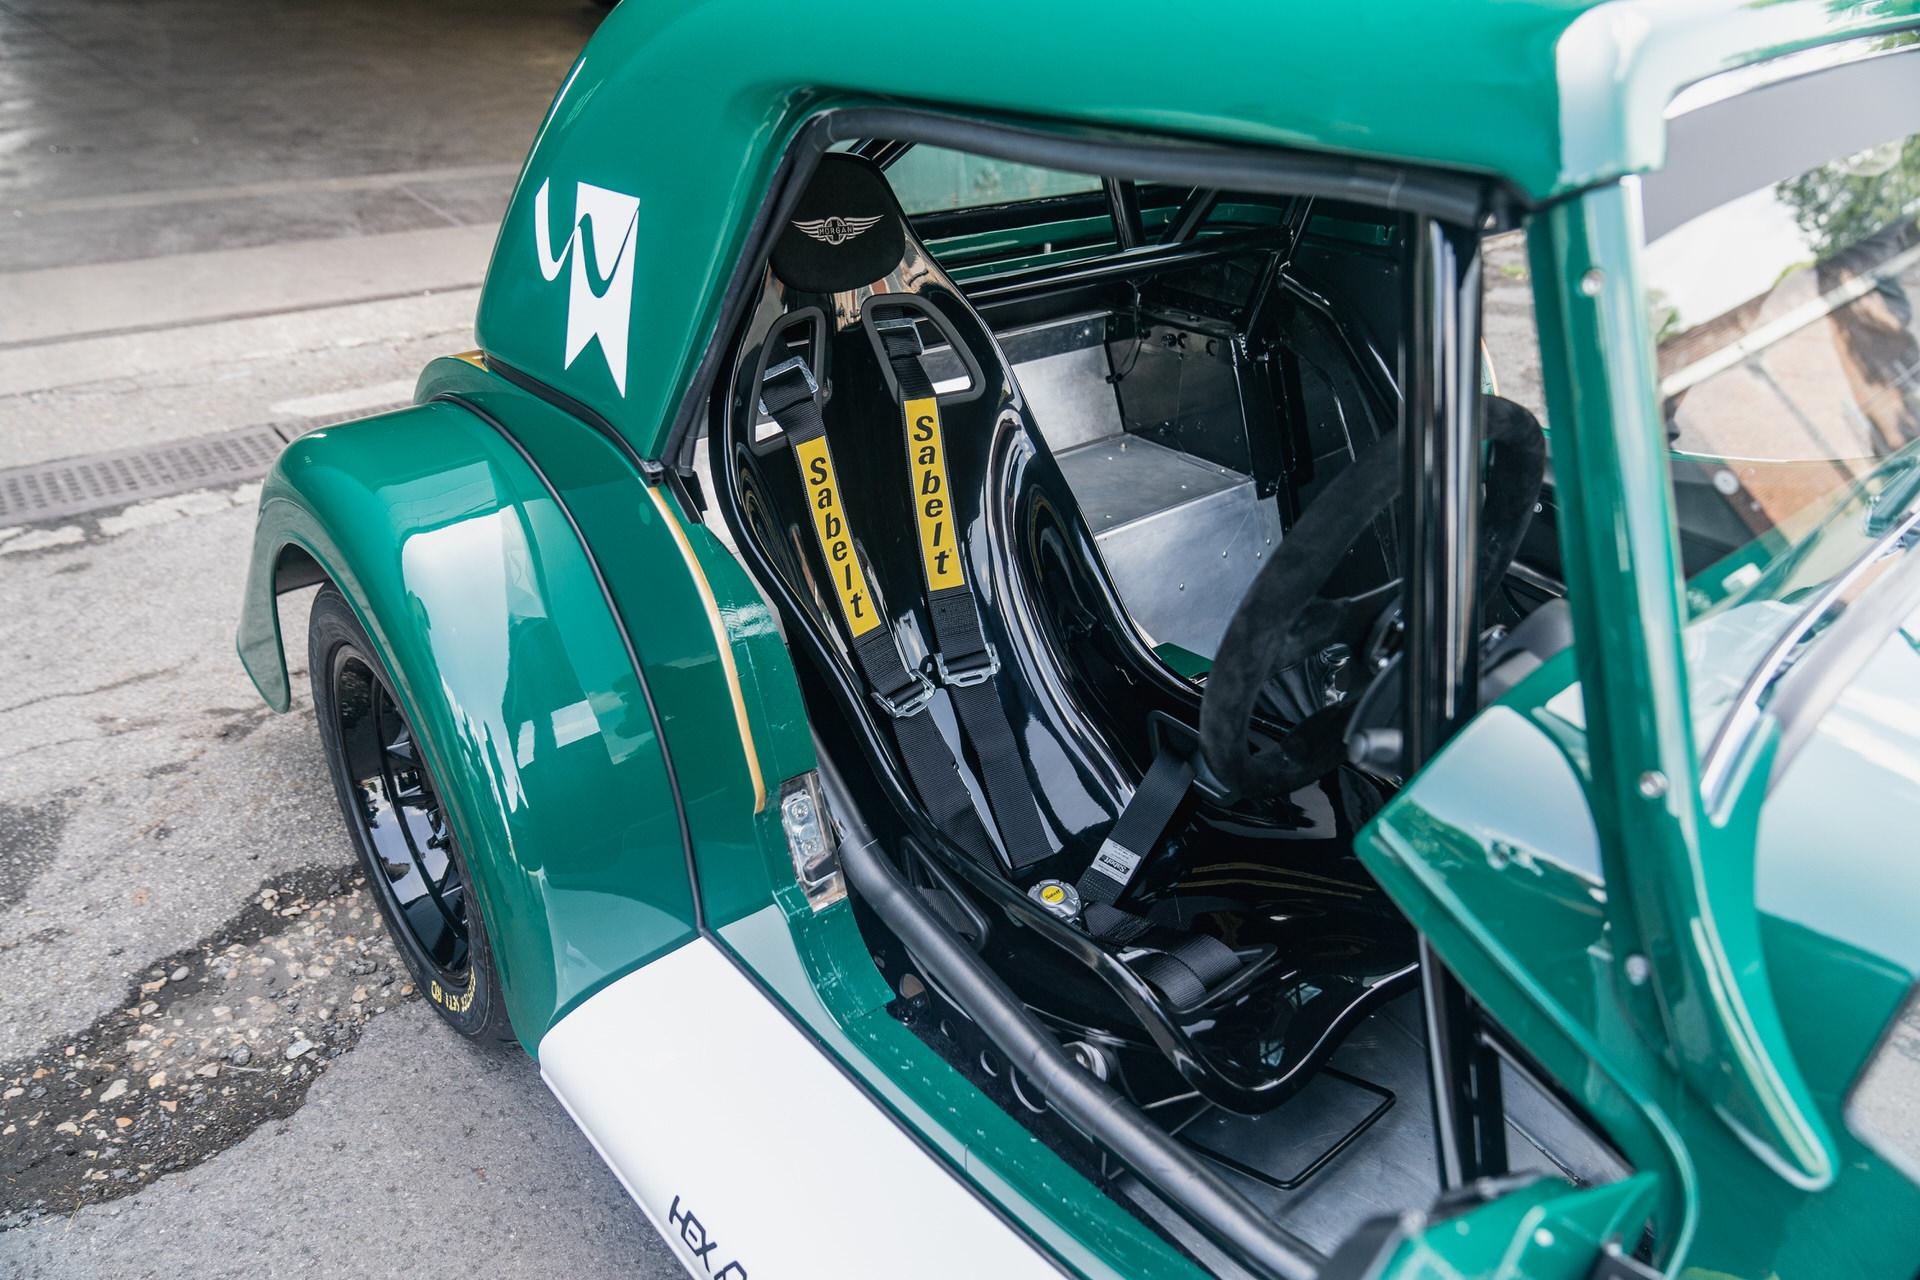 Morgan Plus Four racer seat